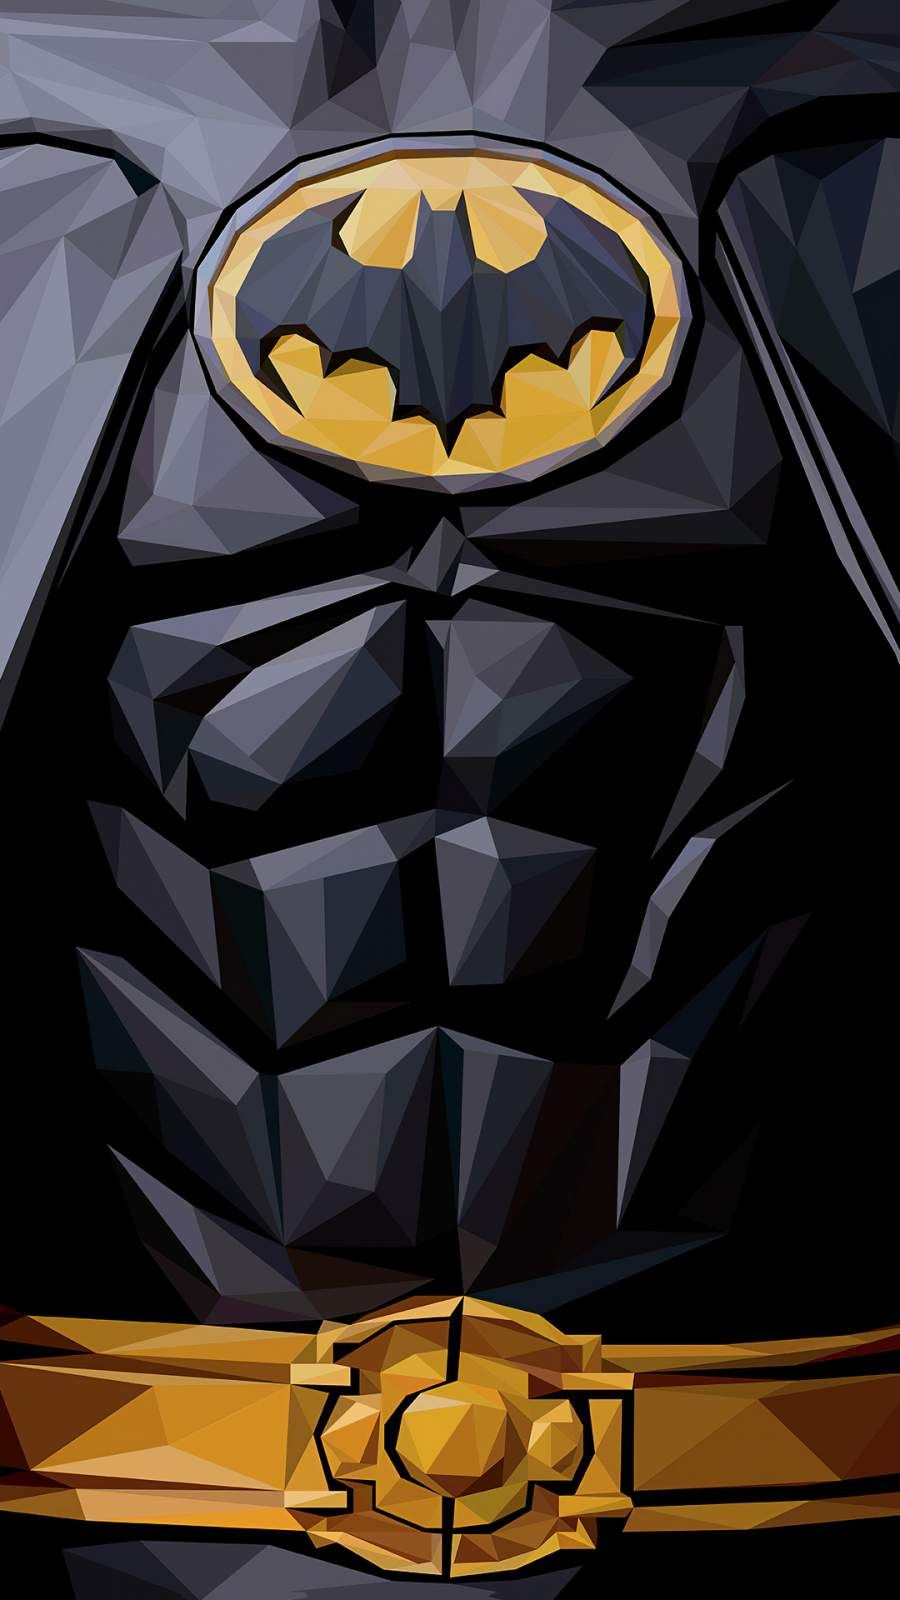 Batman Polygon 4k Iphone Wallpaper In 2020 Batman Artwork Hd Batman Wallpaper Batman